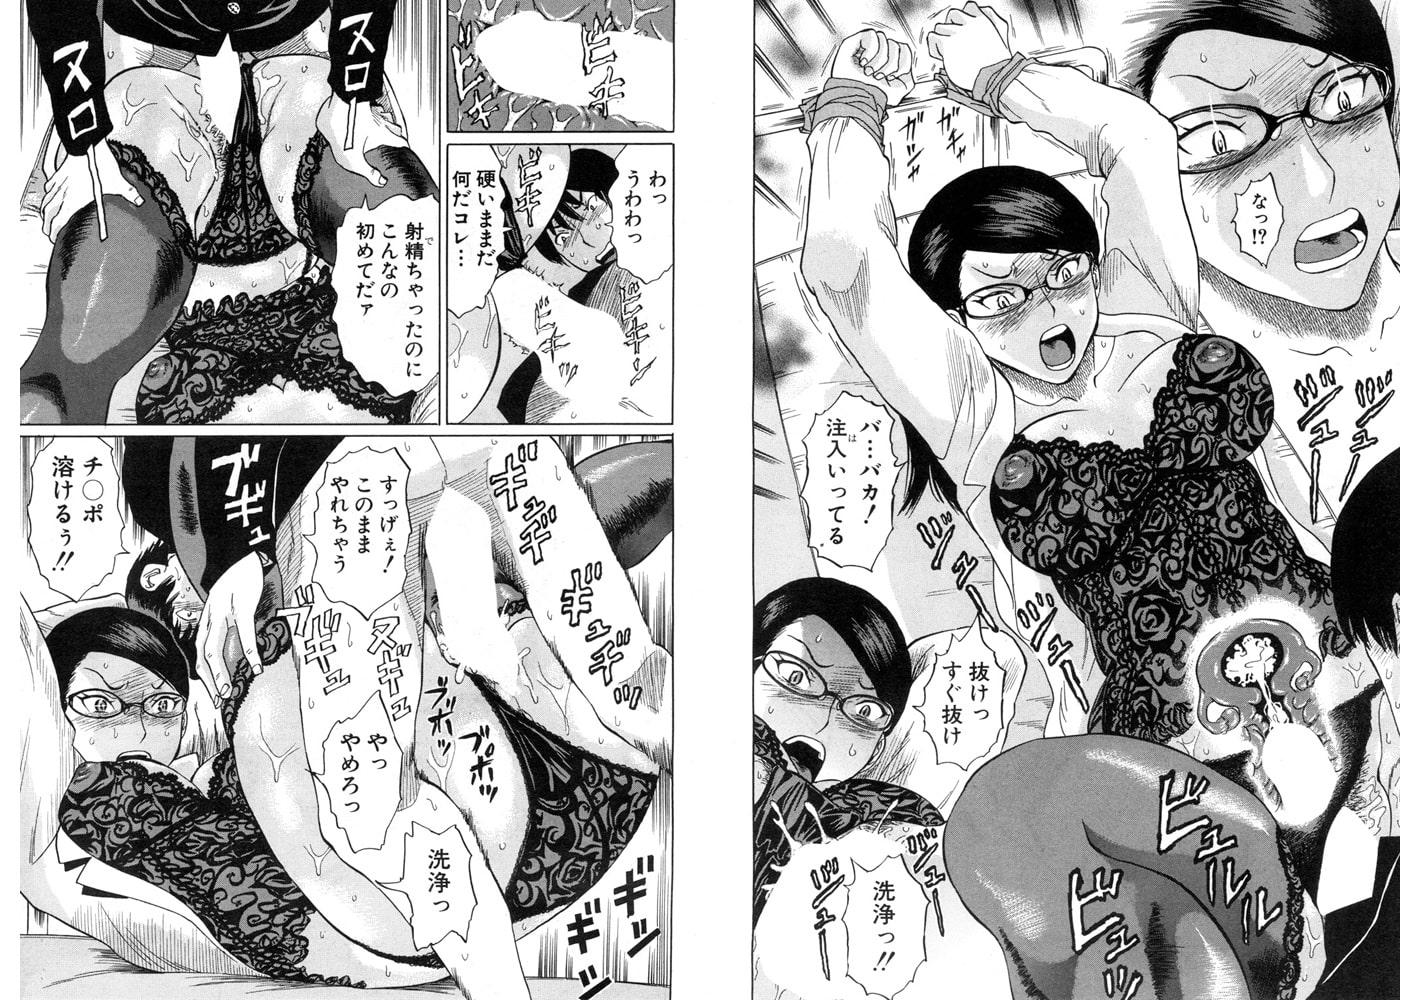 COMIC 夢幻転生 2019年1月号のサンプル5